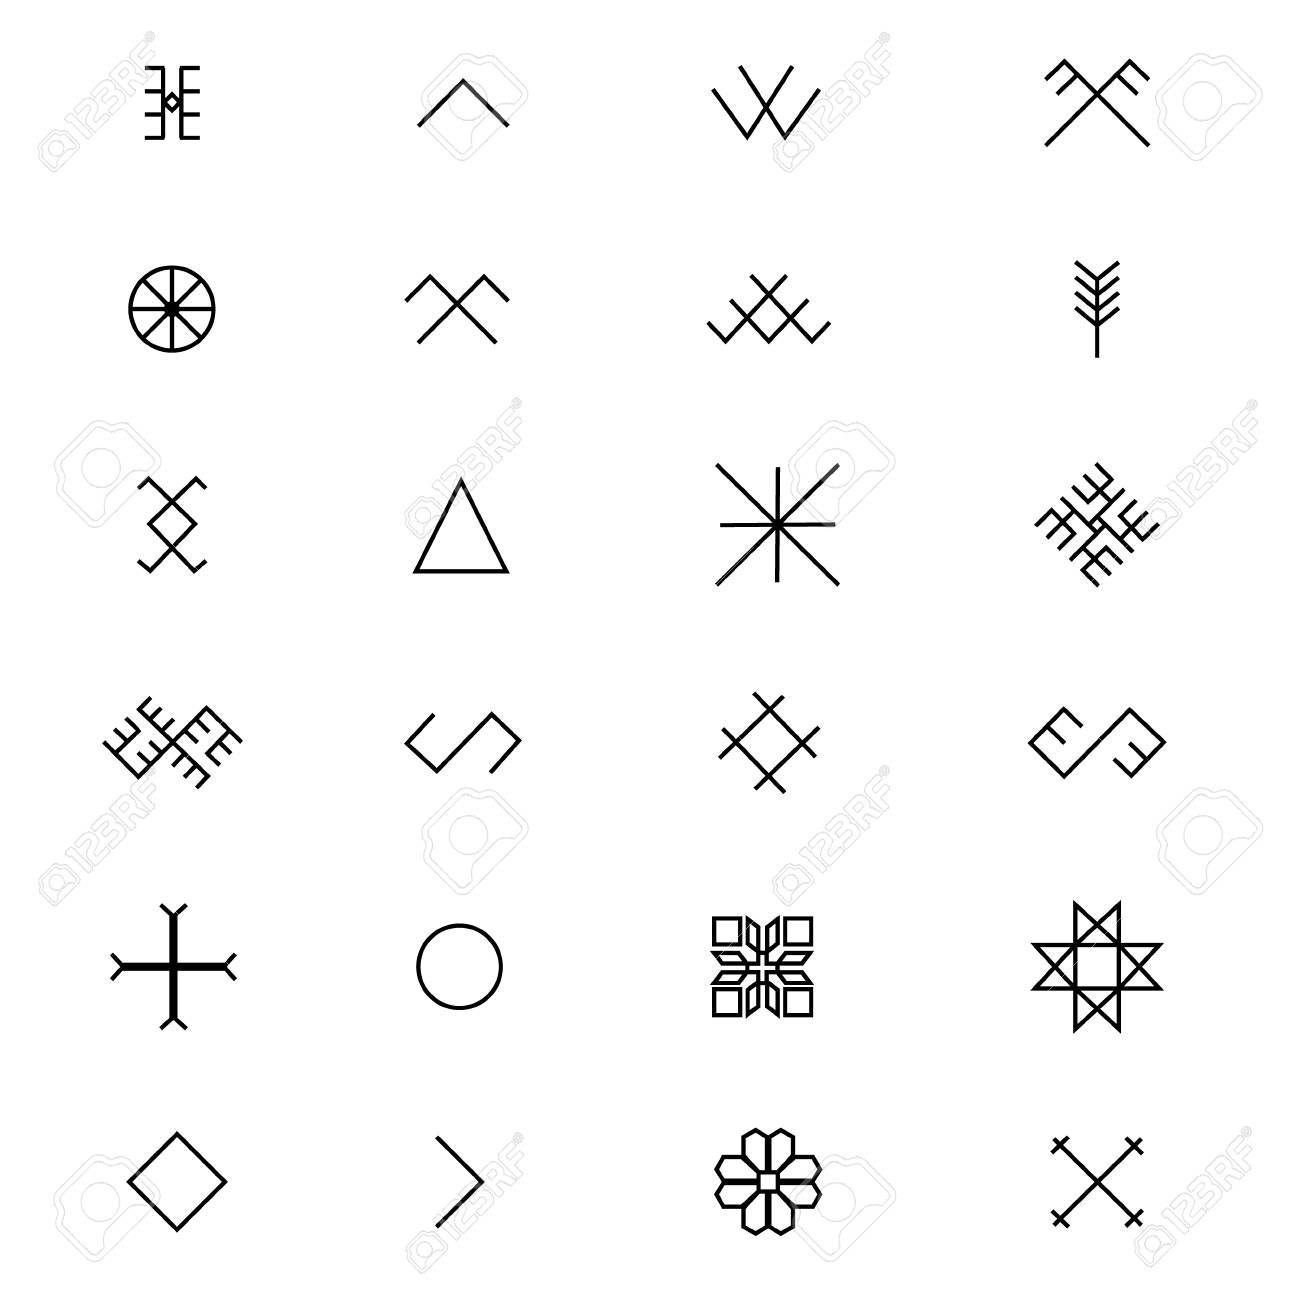 Variations Of The Ancient Latvian Sign Symbols Raster Set